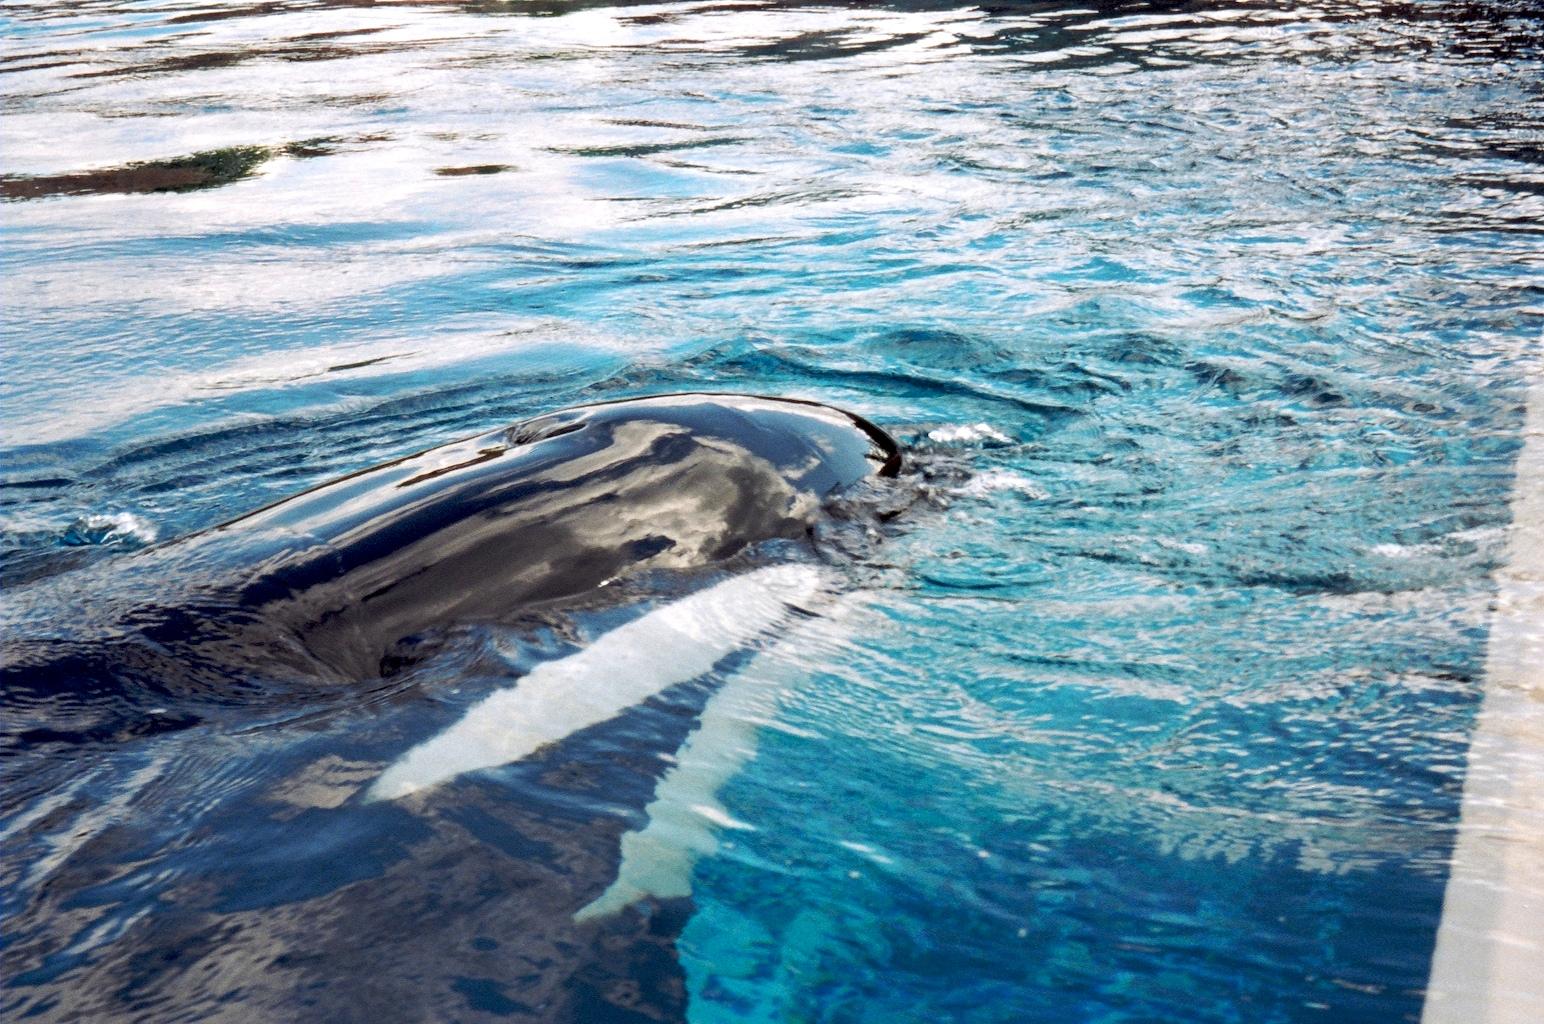 File:Killer Whale at Marineland.jpg - Wikimedia Commons